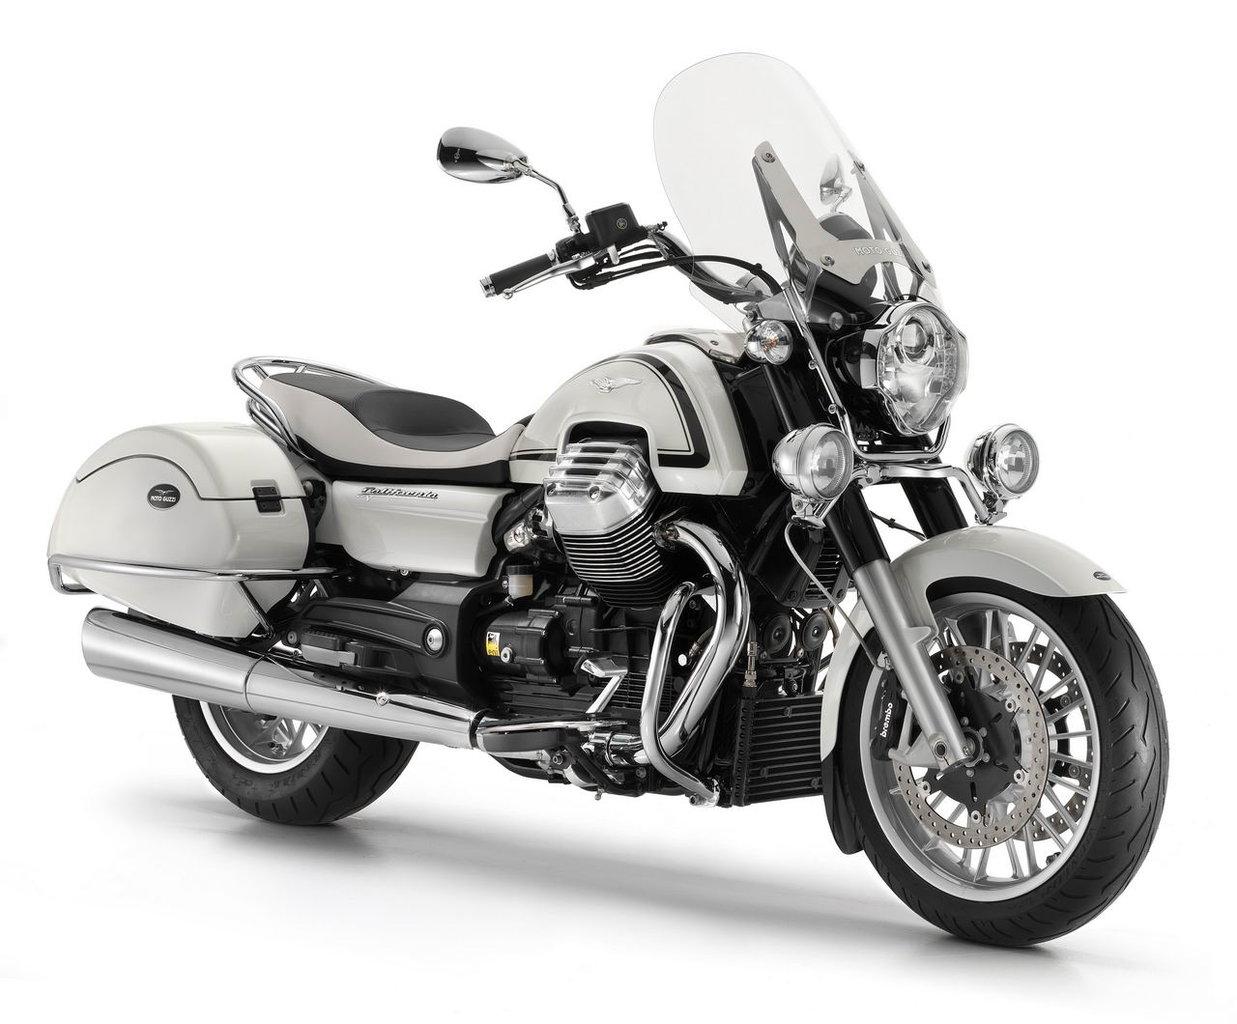 Listino Moto-Guzzi Bellagio 940 Custom e Cruiser - image 14950_moto-guzzi-california1400-touring on https://moto.motori.net